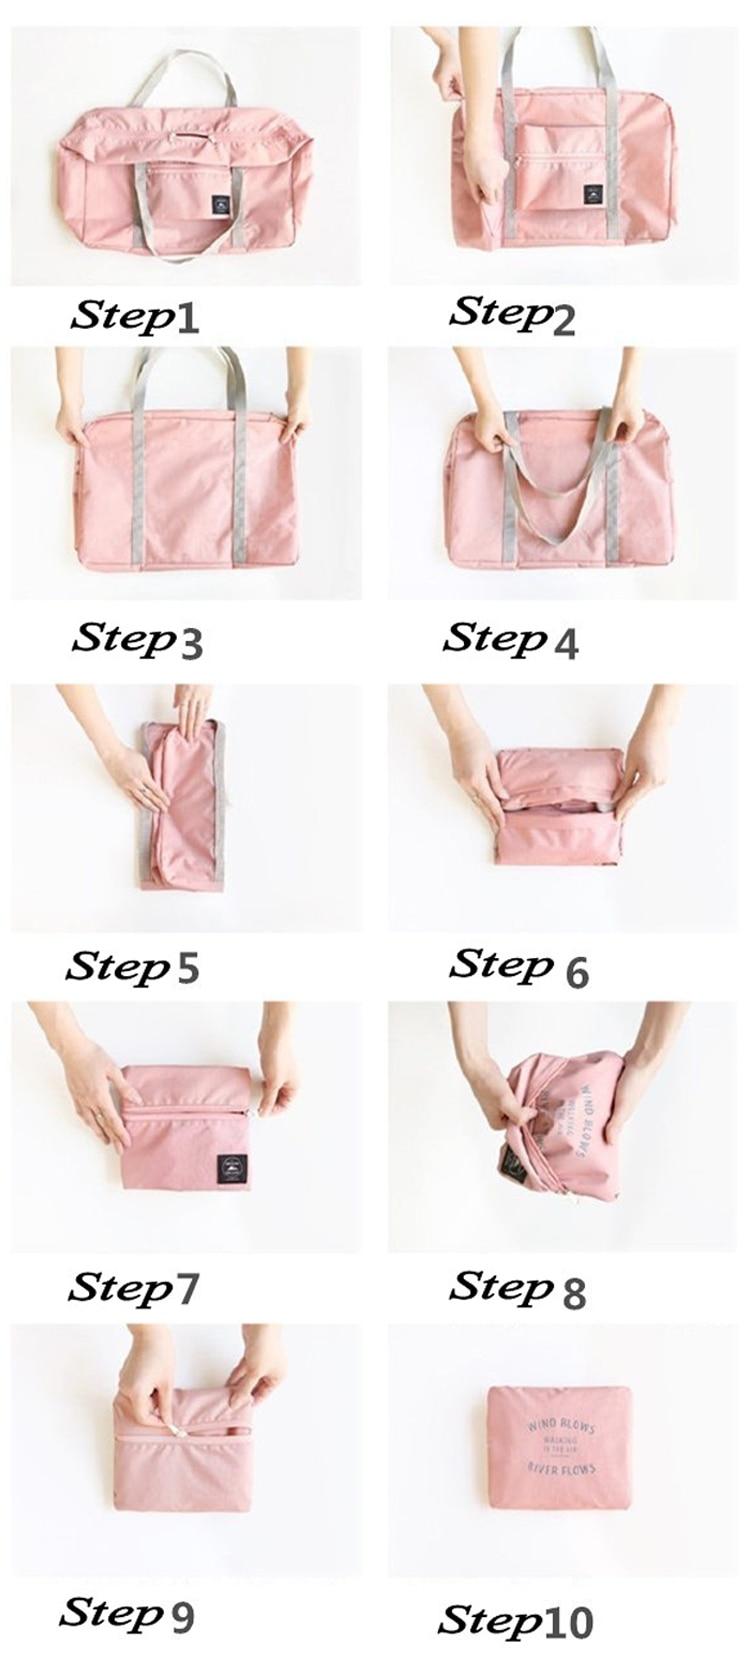 2018-NEW-Folding-Travel-Bag-Nylon-Travel-Bags-Hand-Luggage-for-Men-Women-Fashion-Travel-Duffle-Bags-Tote-Large-Handbags-Duffel-569_04